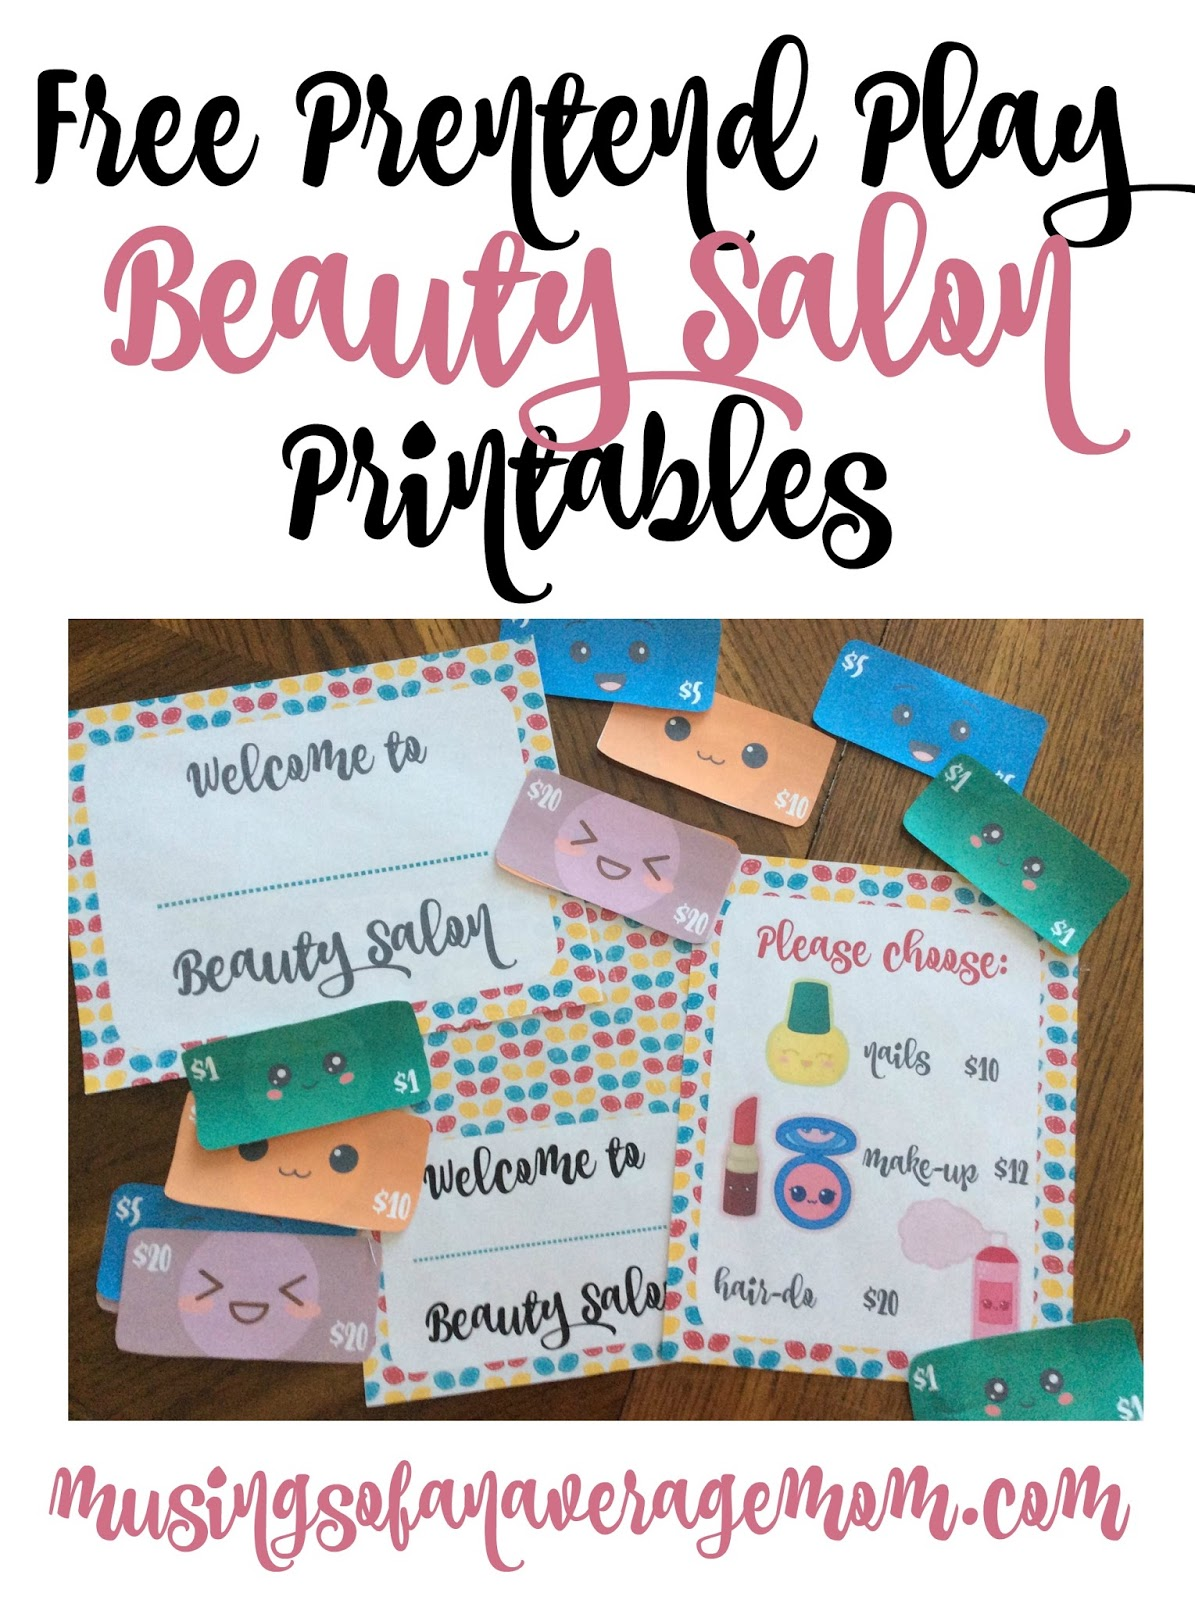 Musings of an Average Mom: Beauty Salon Printables